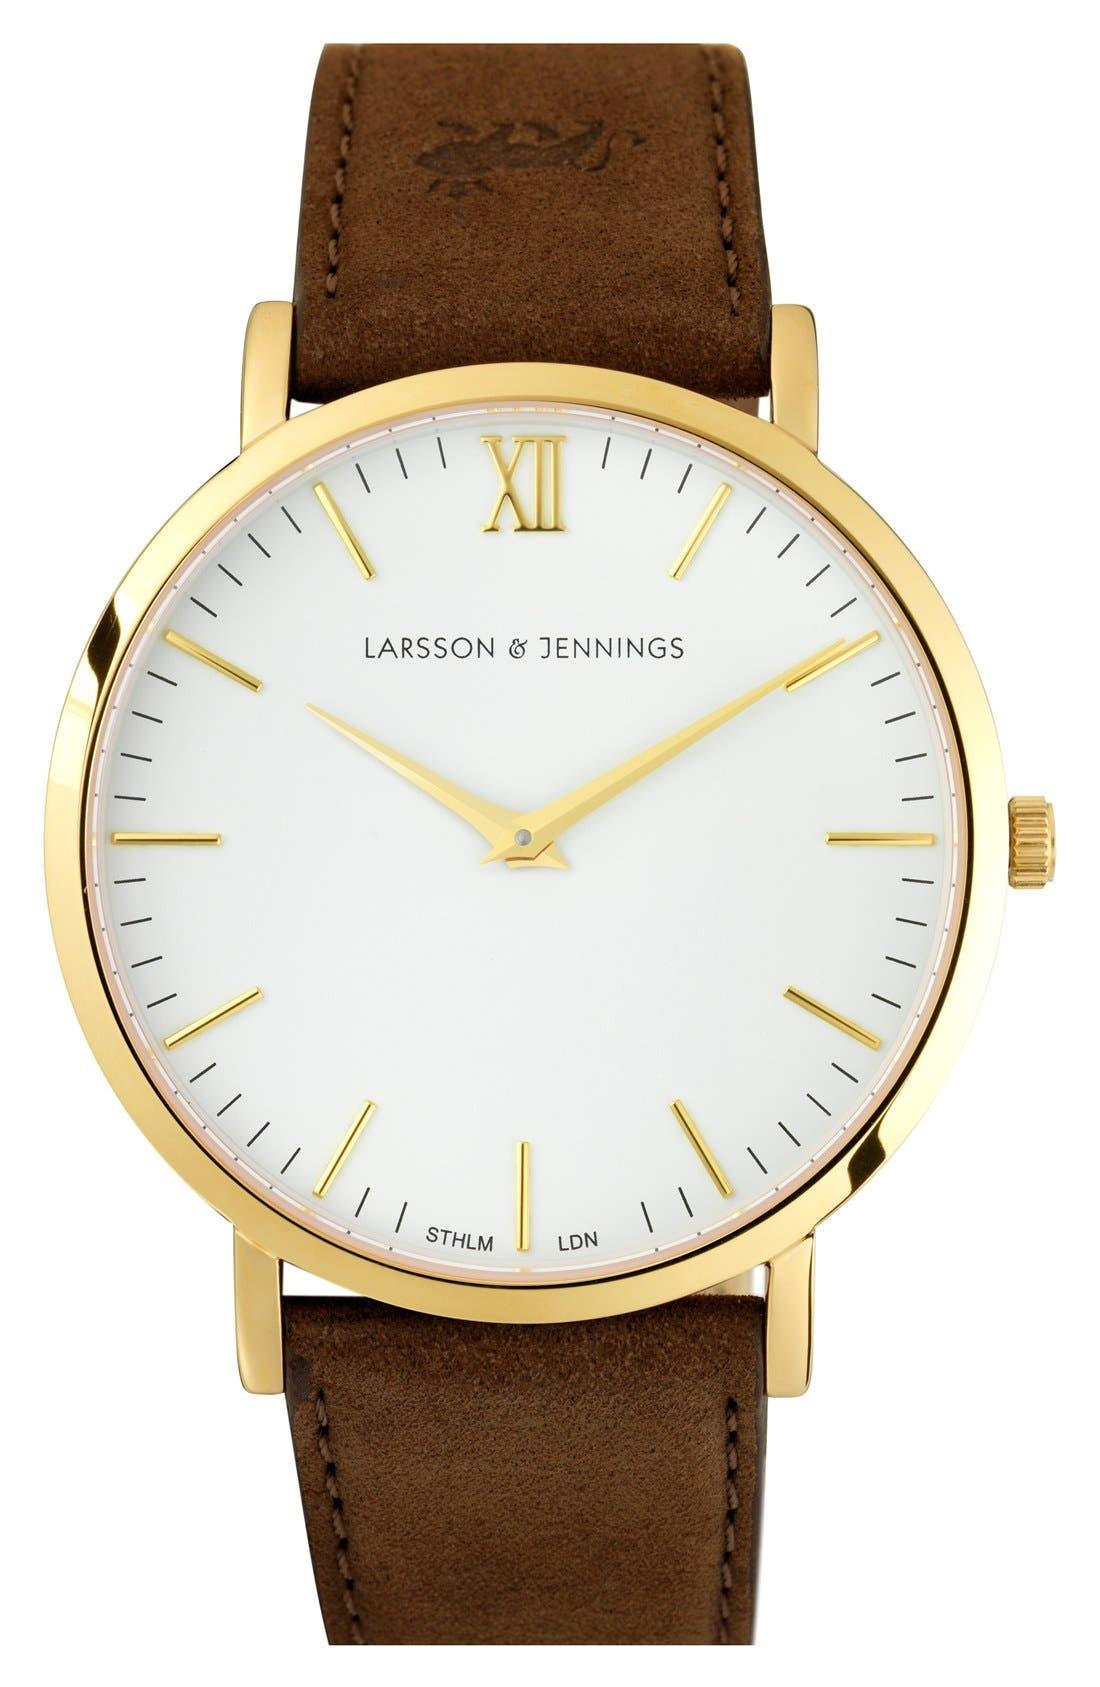 LARSSON & JENNINGS Lugano Leather Strap Watch, 40mm